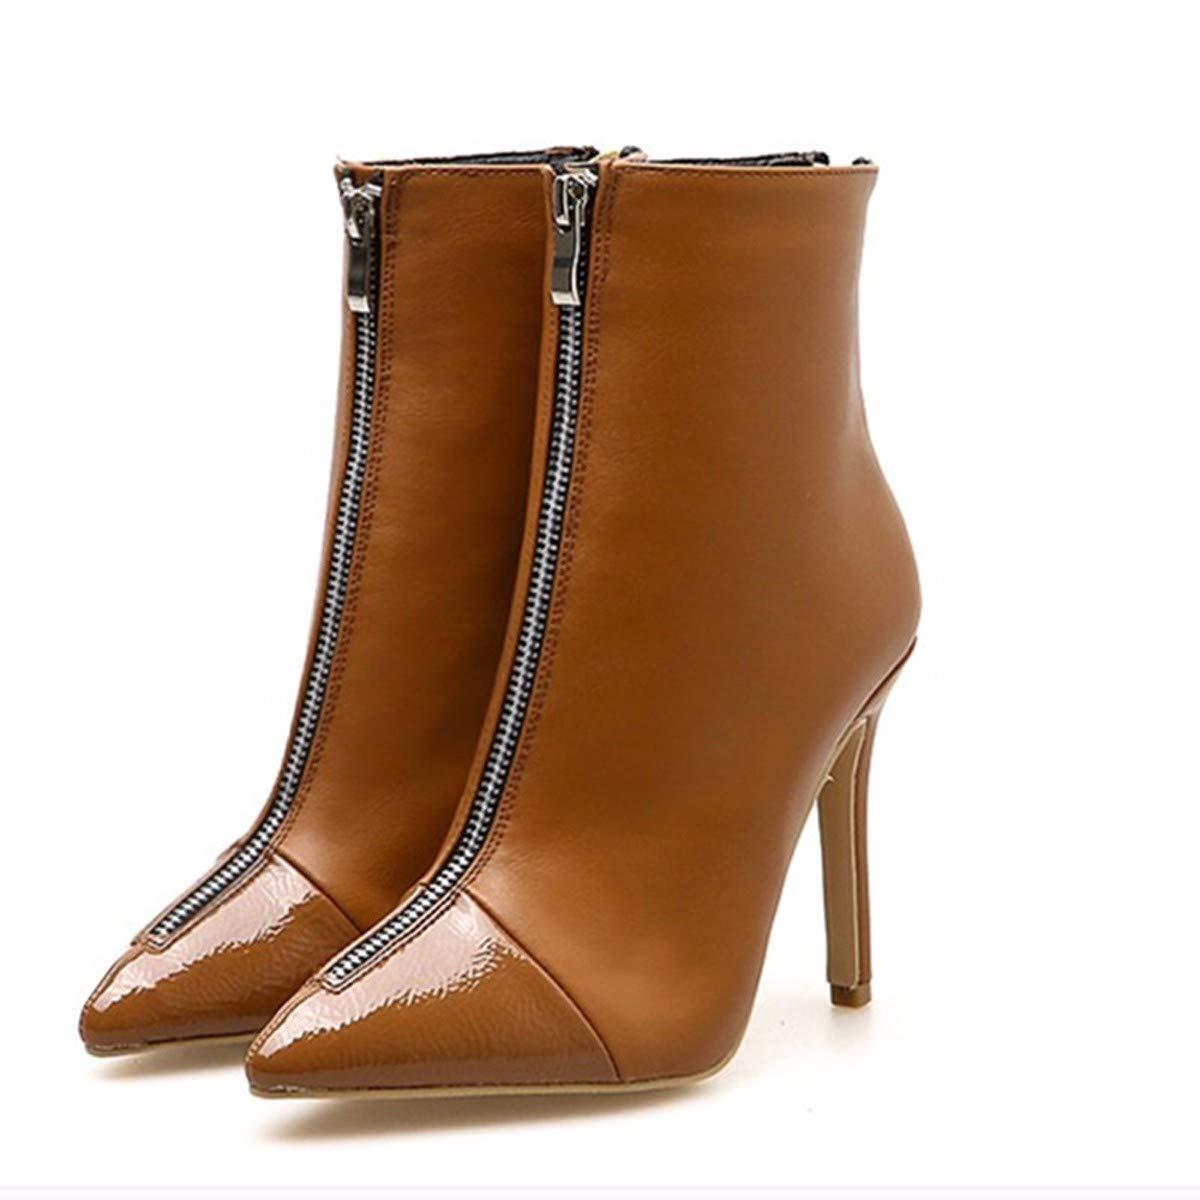 LBTSQ-Mode Damenschuhe Kurze Stiefel Mit Hohen 10Cm Dünne Sohle Stiefeletten Wies Kopf Kurzen Schlauch Single - Reißverschluss Ma Dingxue.